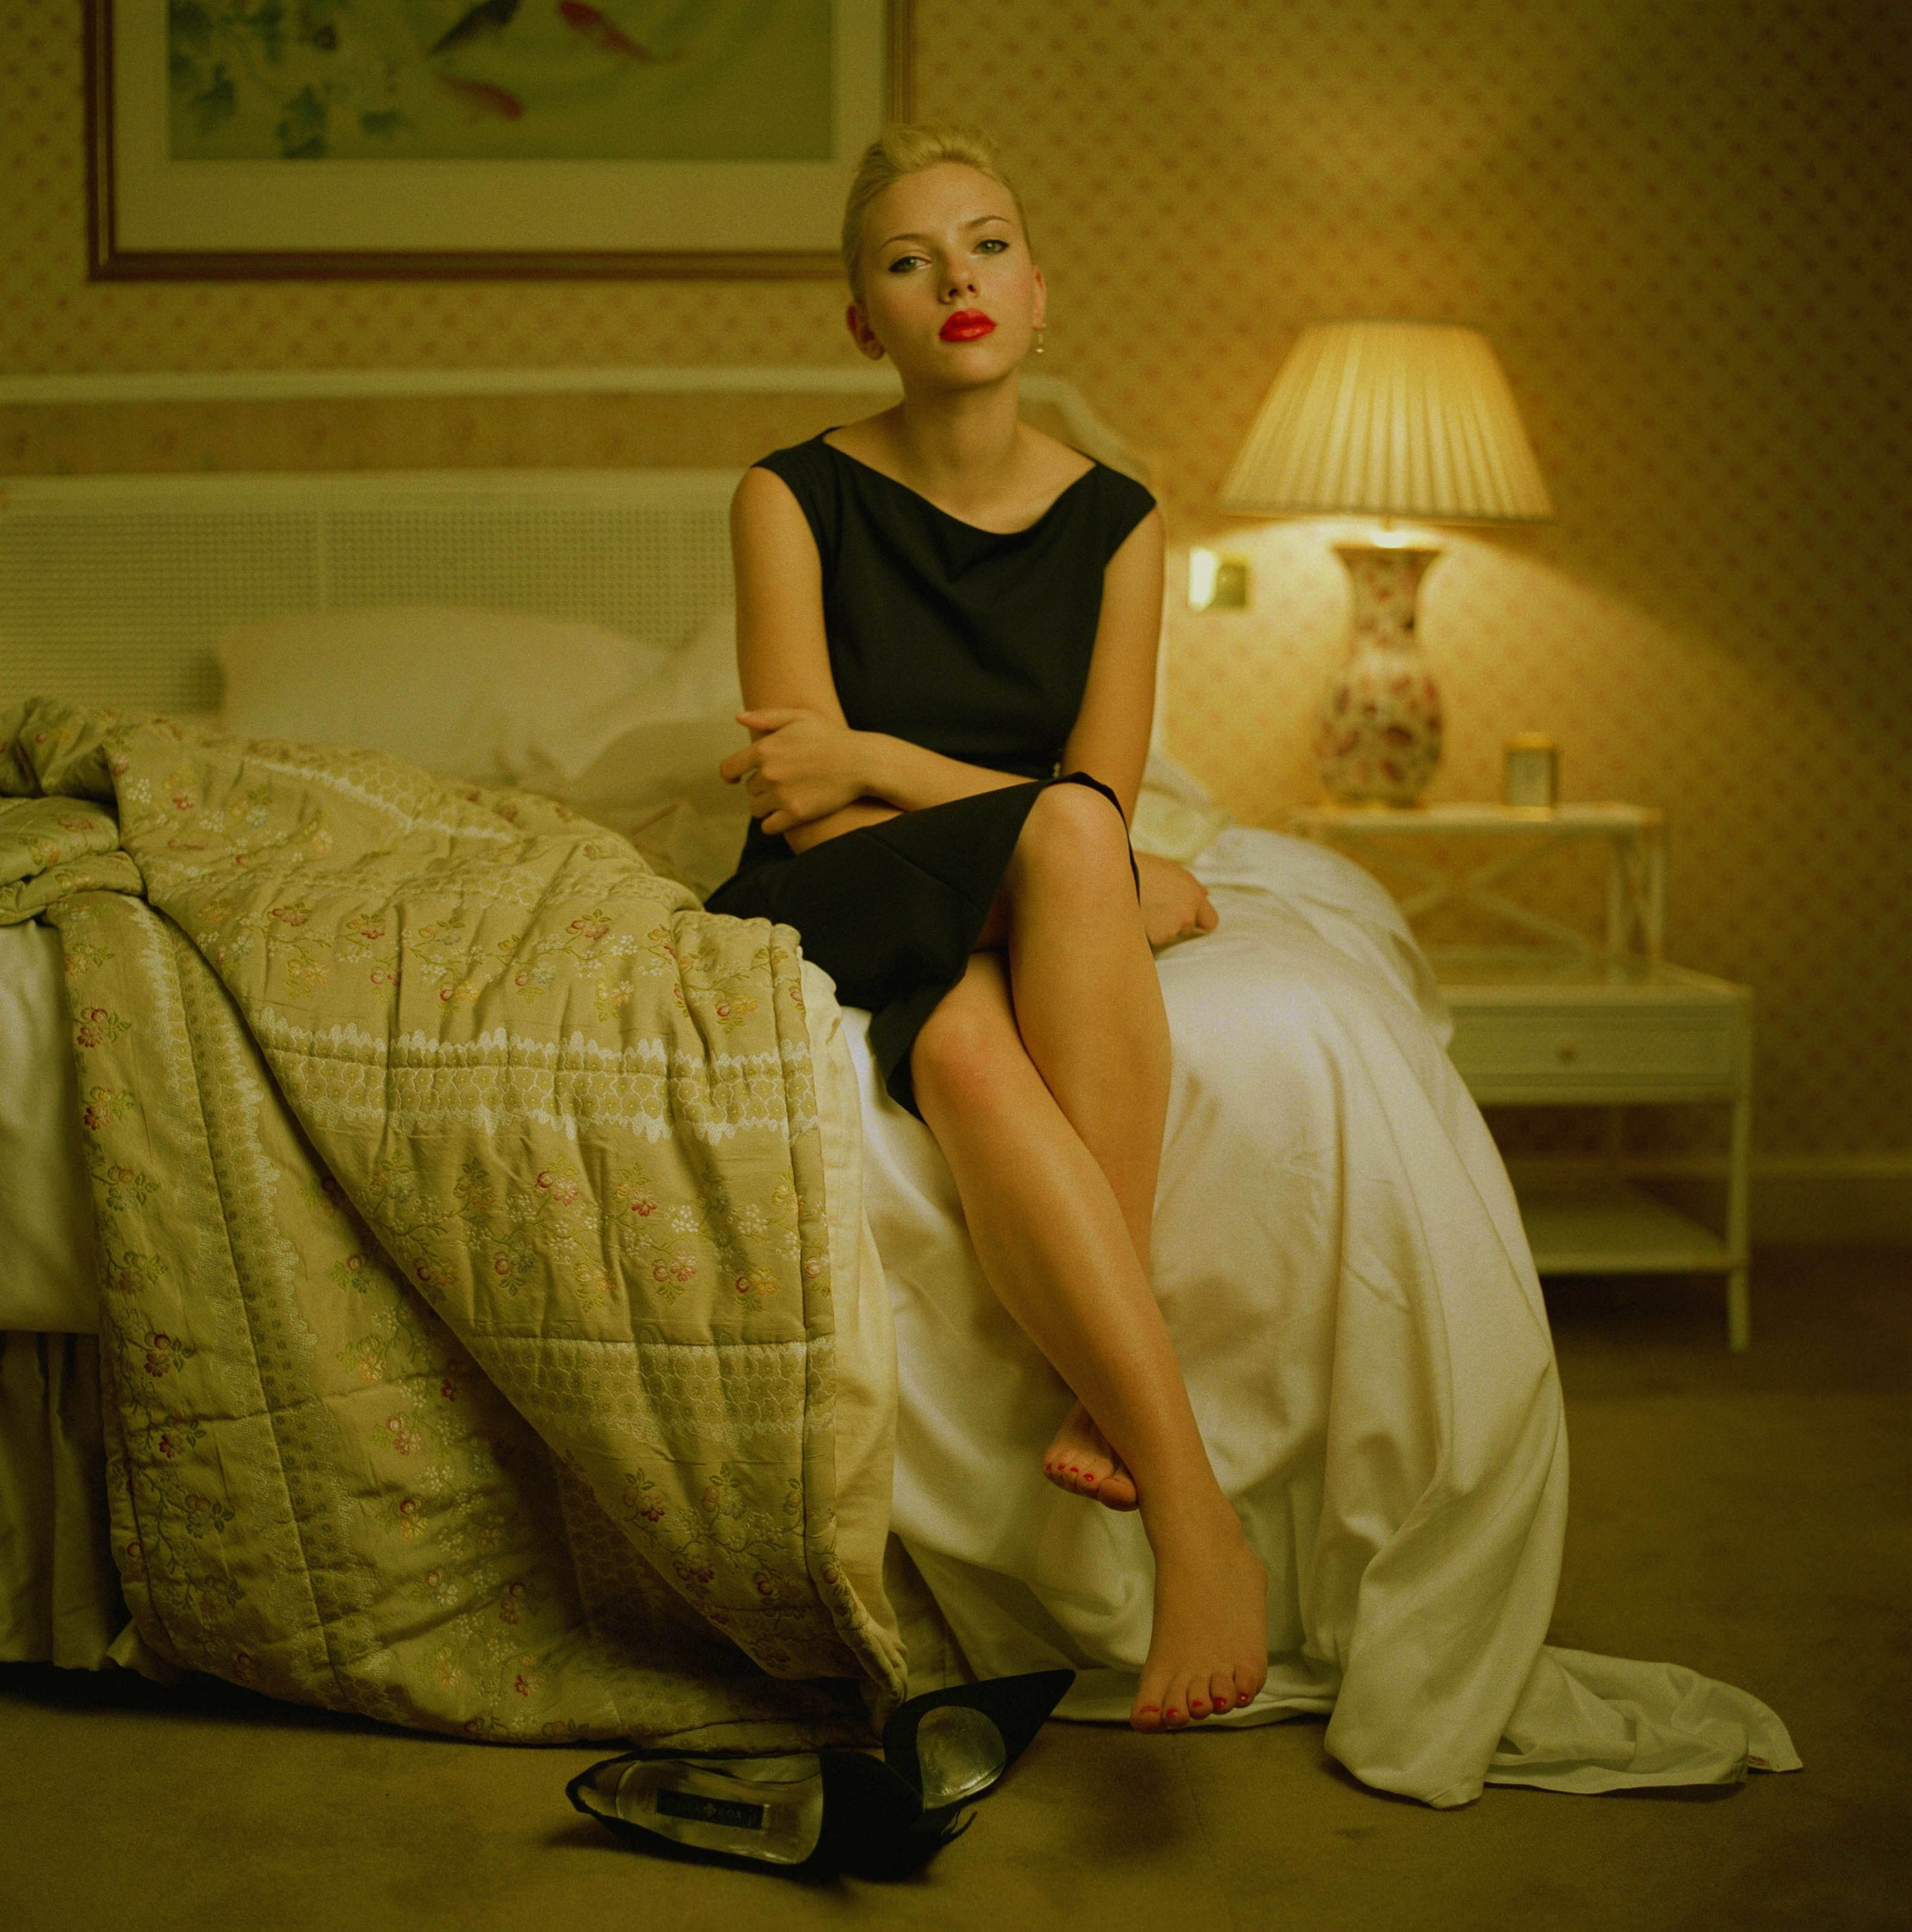 Scarlett Johansson in Jason Bell photoshoot | Celebrity Feet